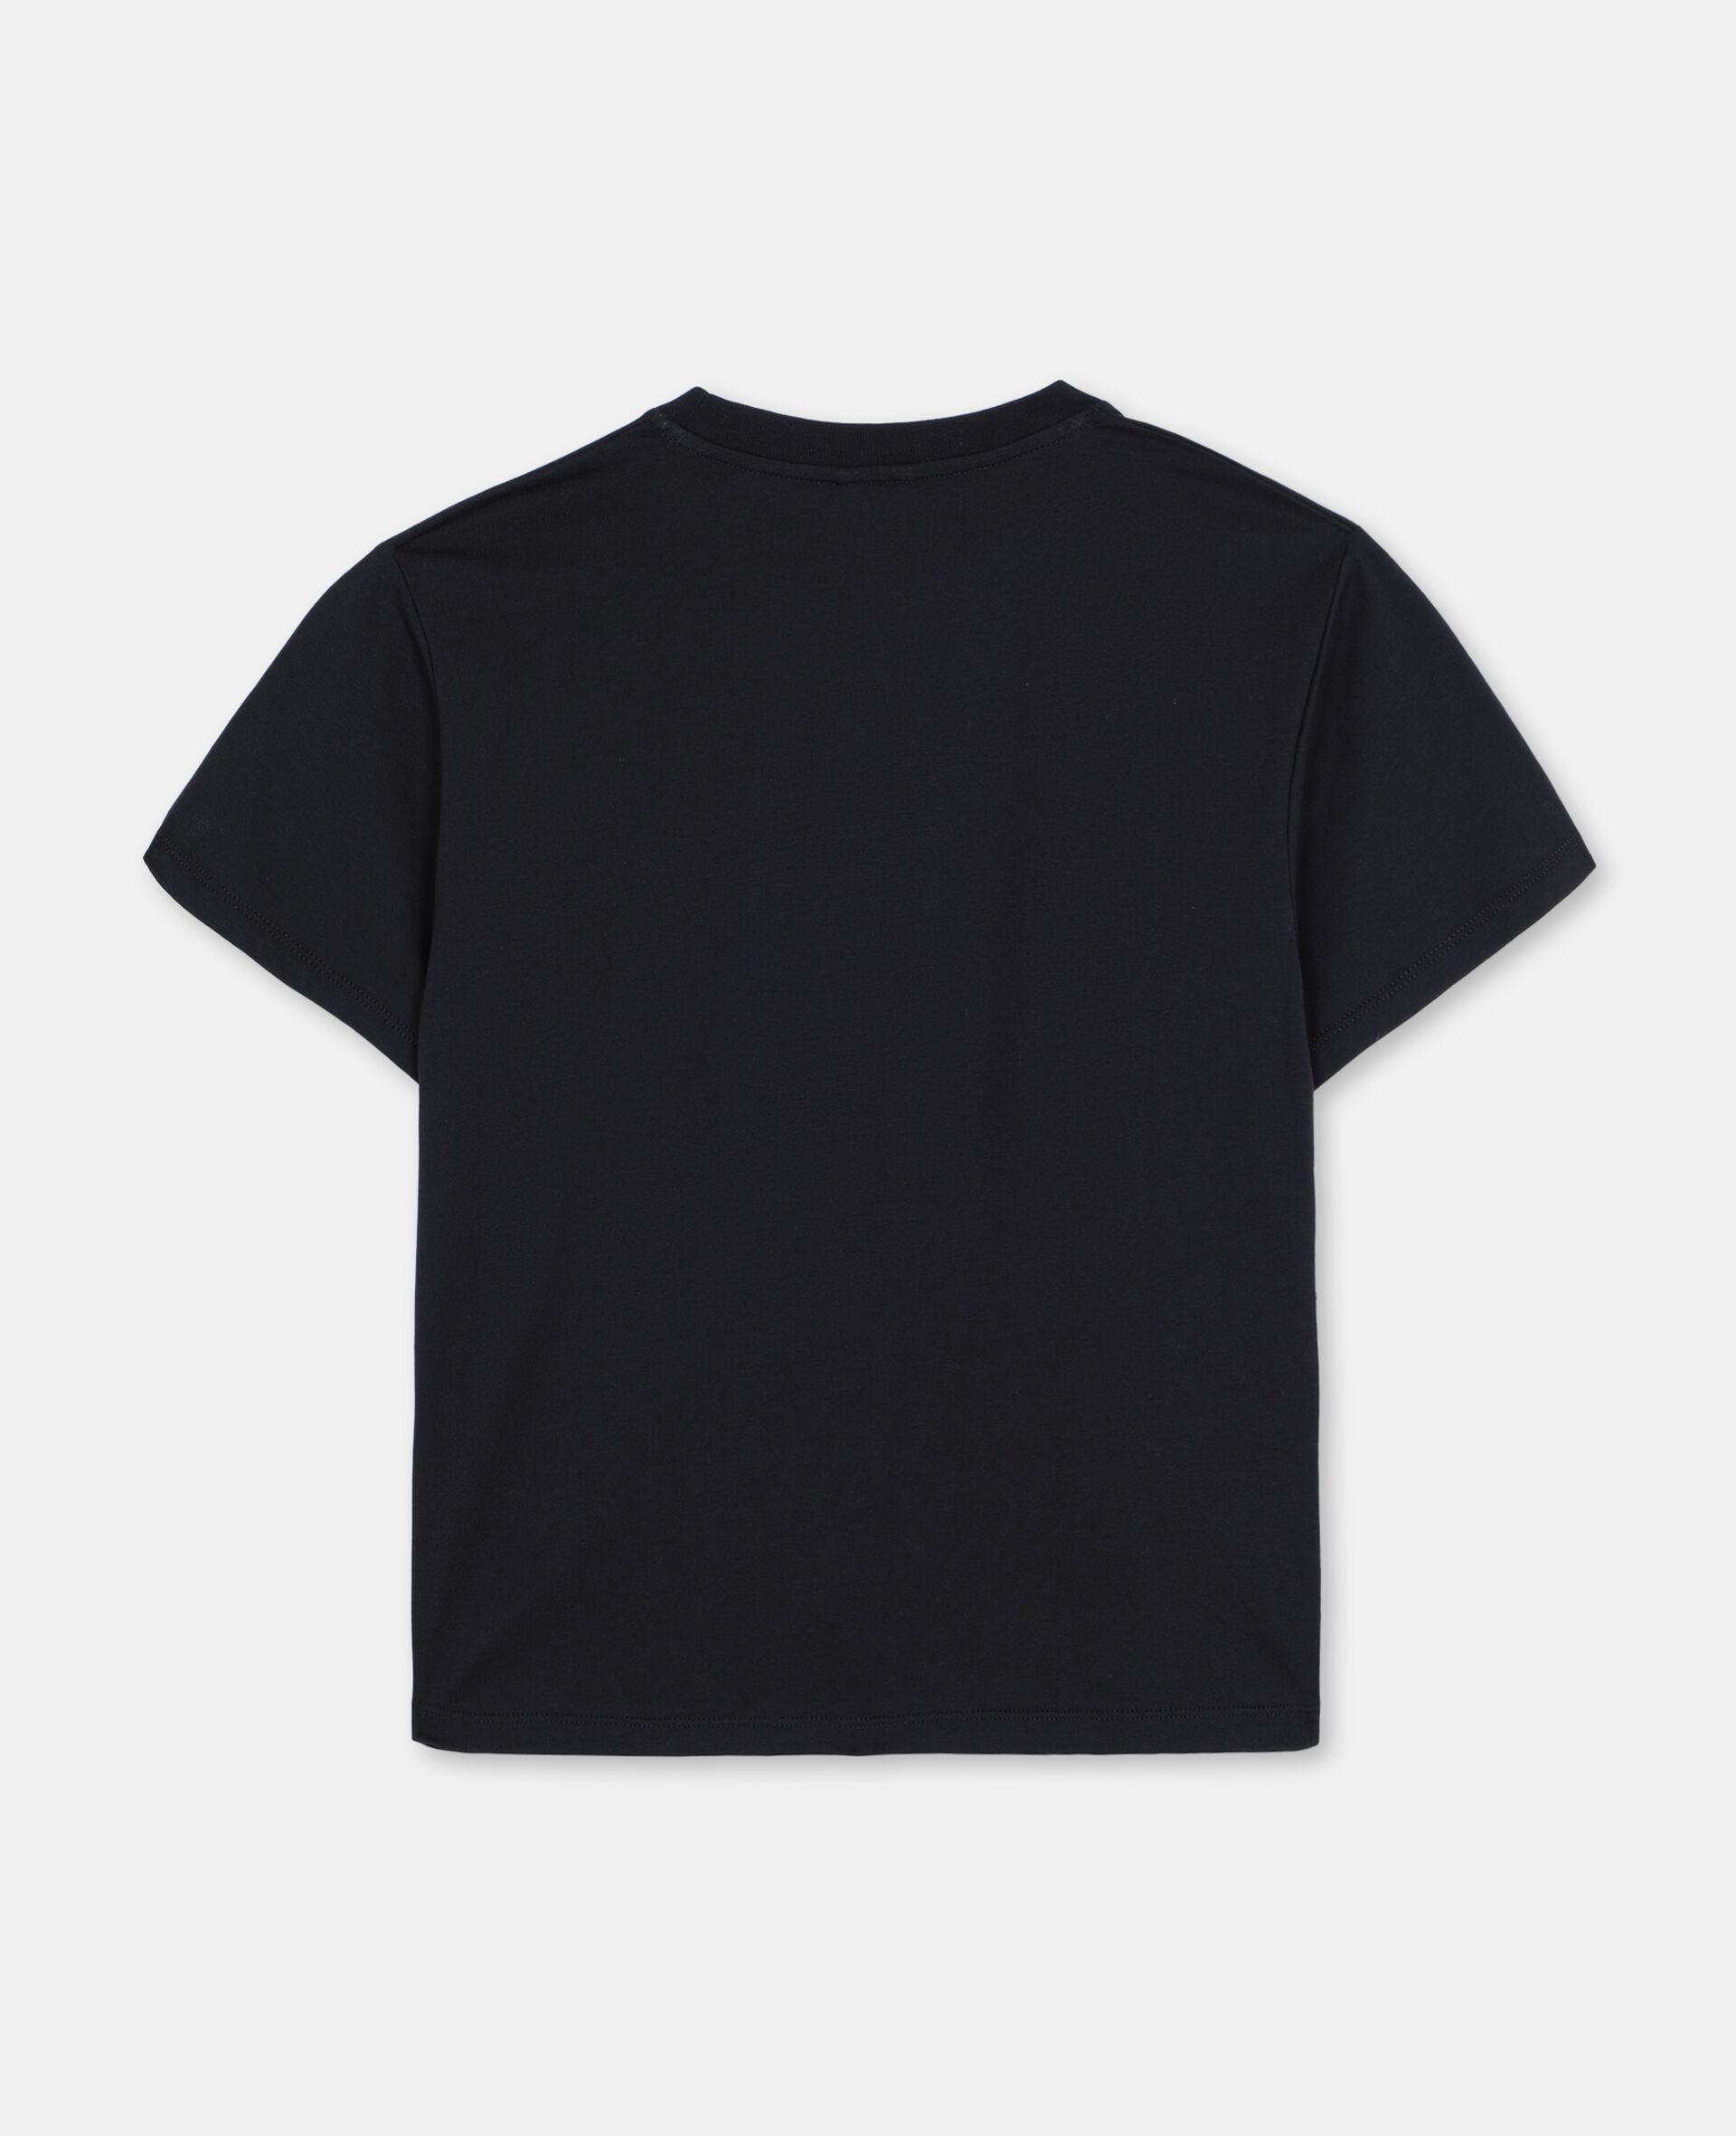 T-shirt oversize en coton à motif skater -Noir-large image number 3